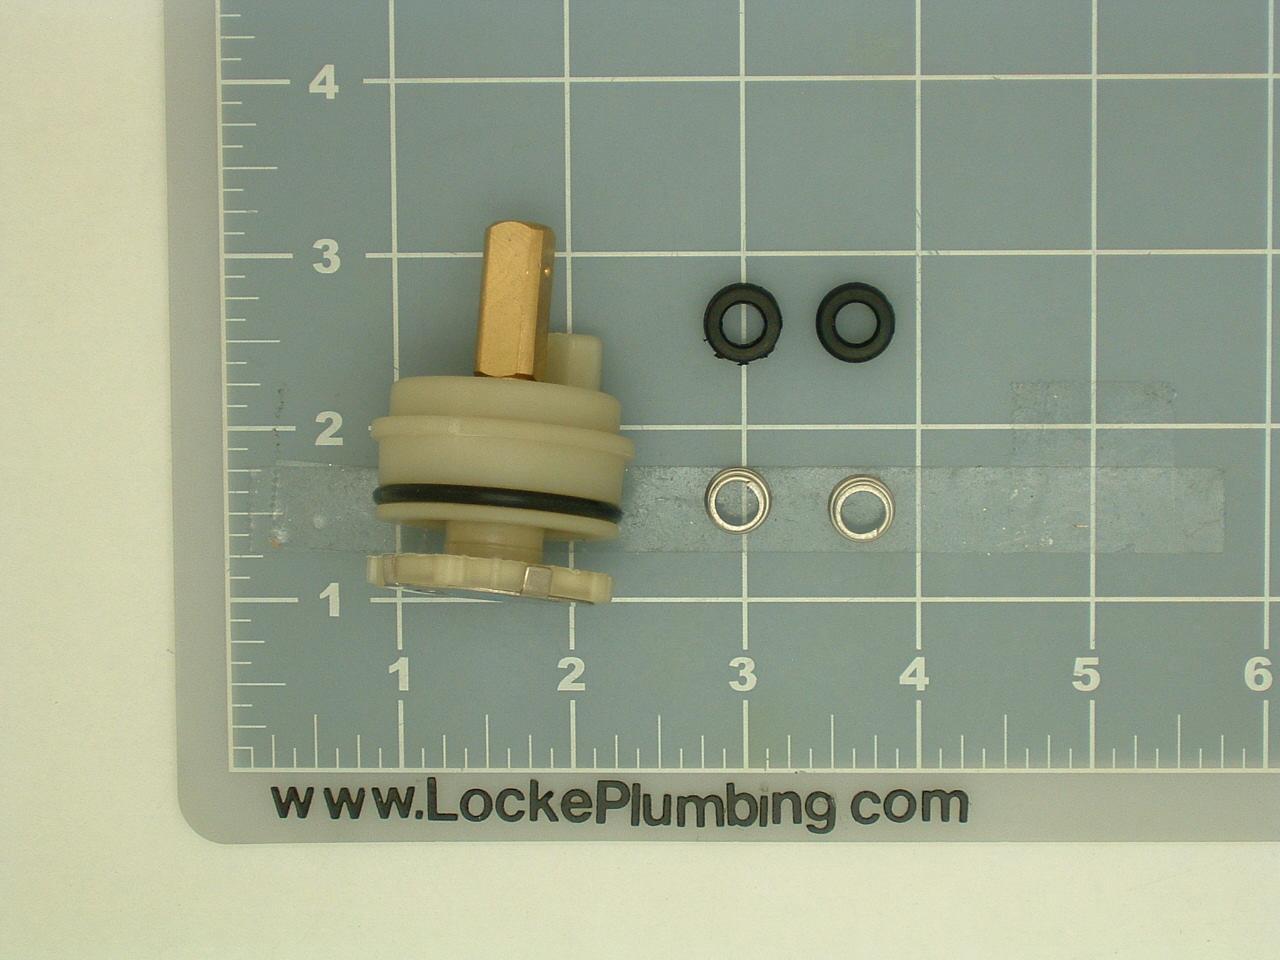 Danze 603566 Single Lever Cartridge Locke Plumbing